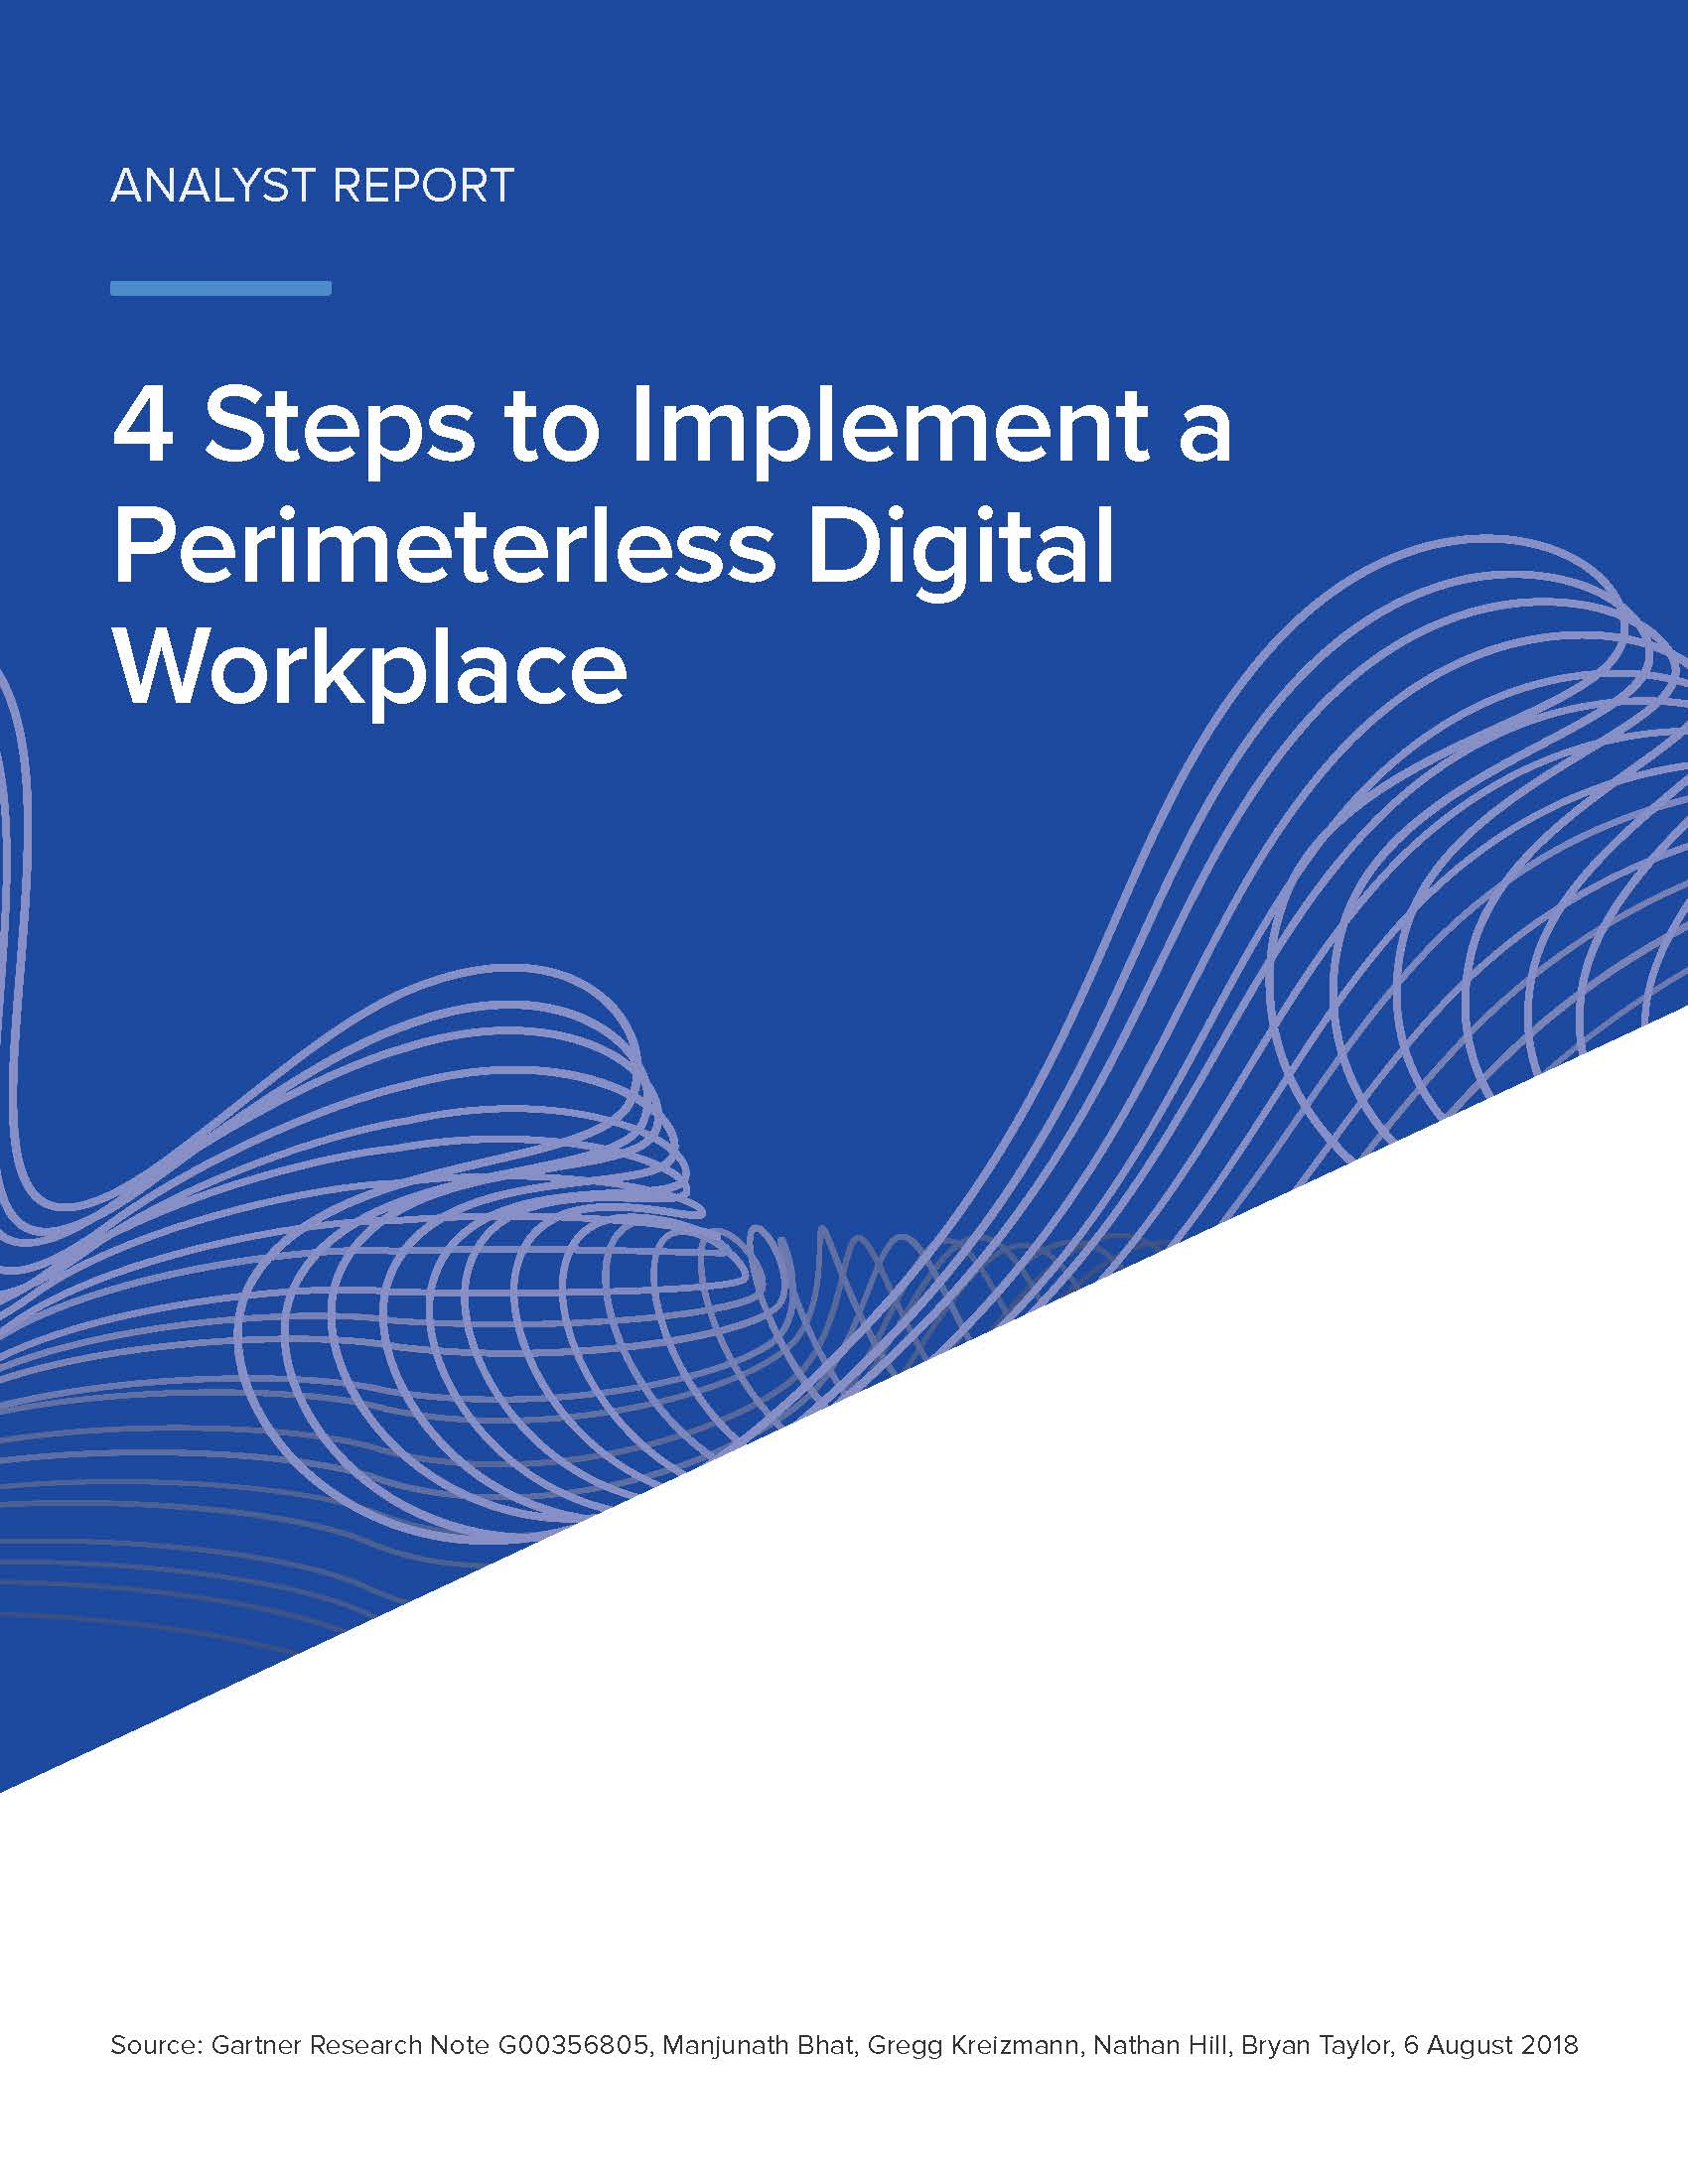 Gartner: 4 Steps to Implement a Perimeterless Digital Workplace